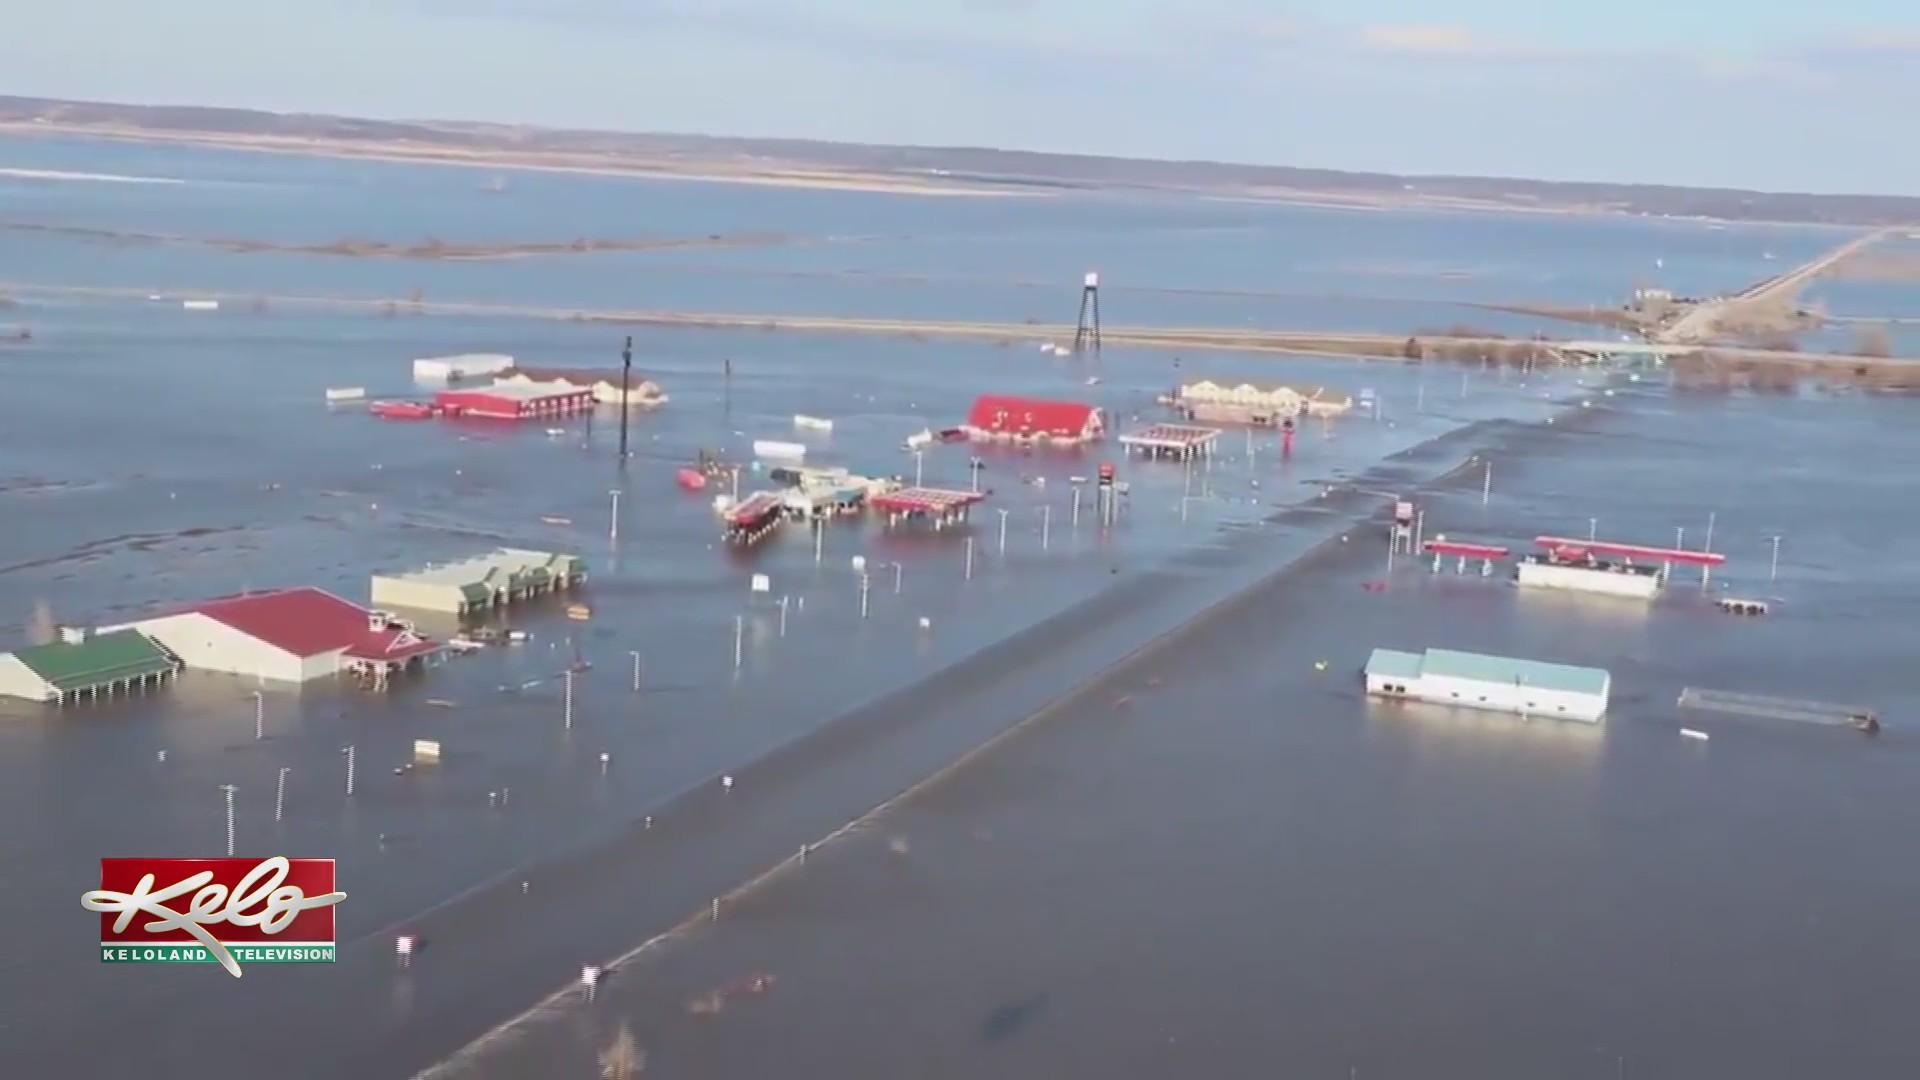 Iowa, Nebraska And Missouri Governors Calling For Change Along Missouri River